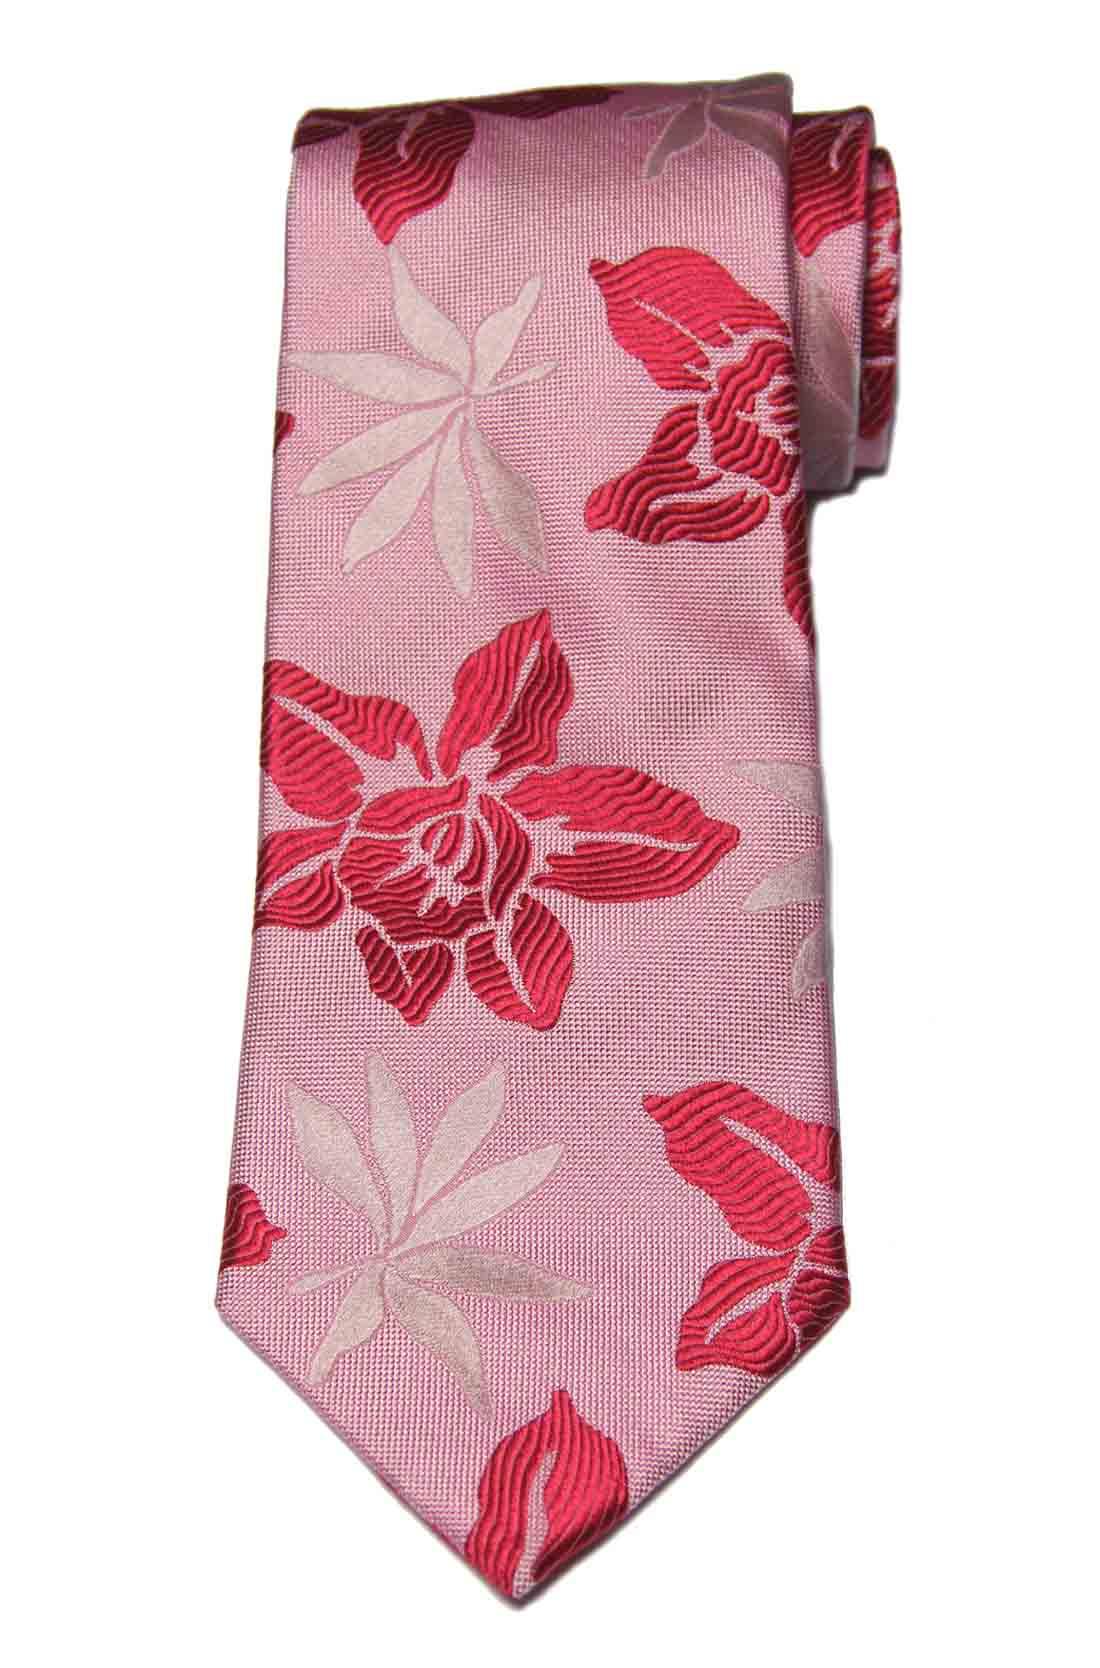 Express Italian Silk Tie Floral Red White Pink Men's